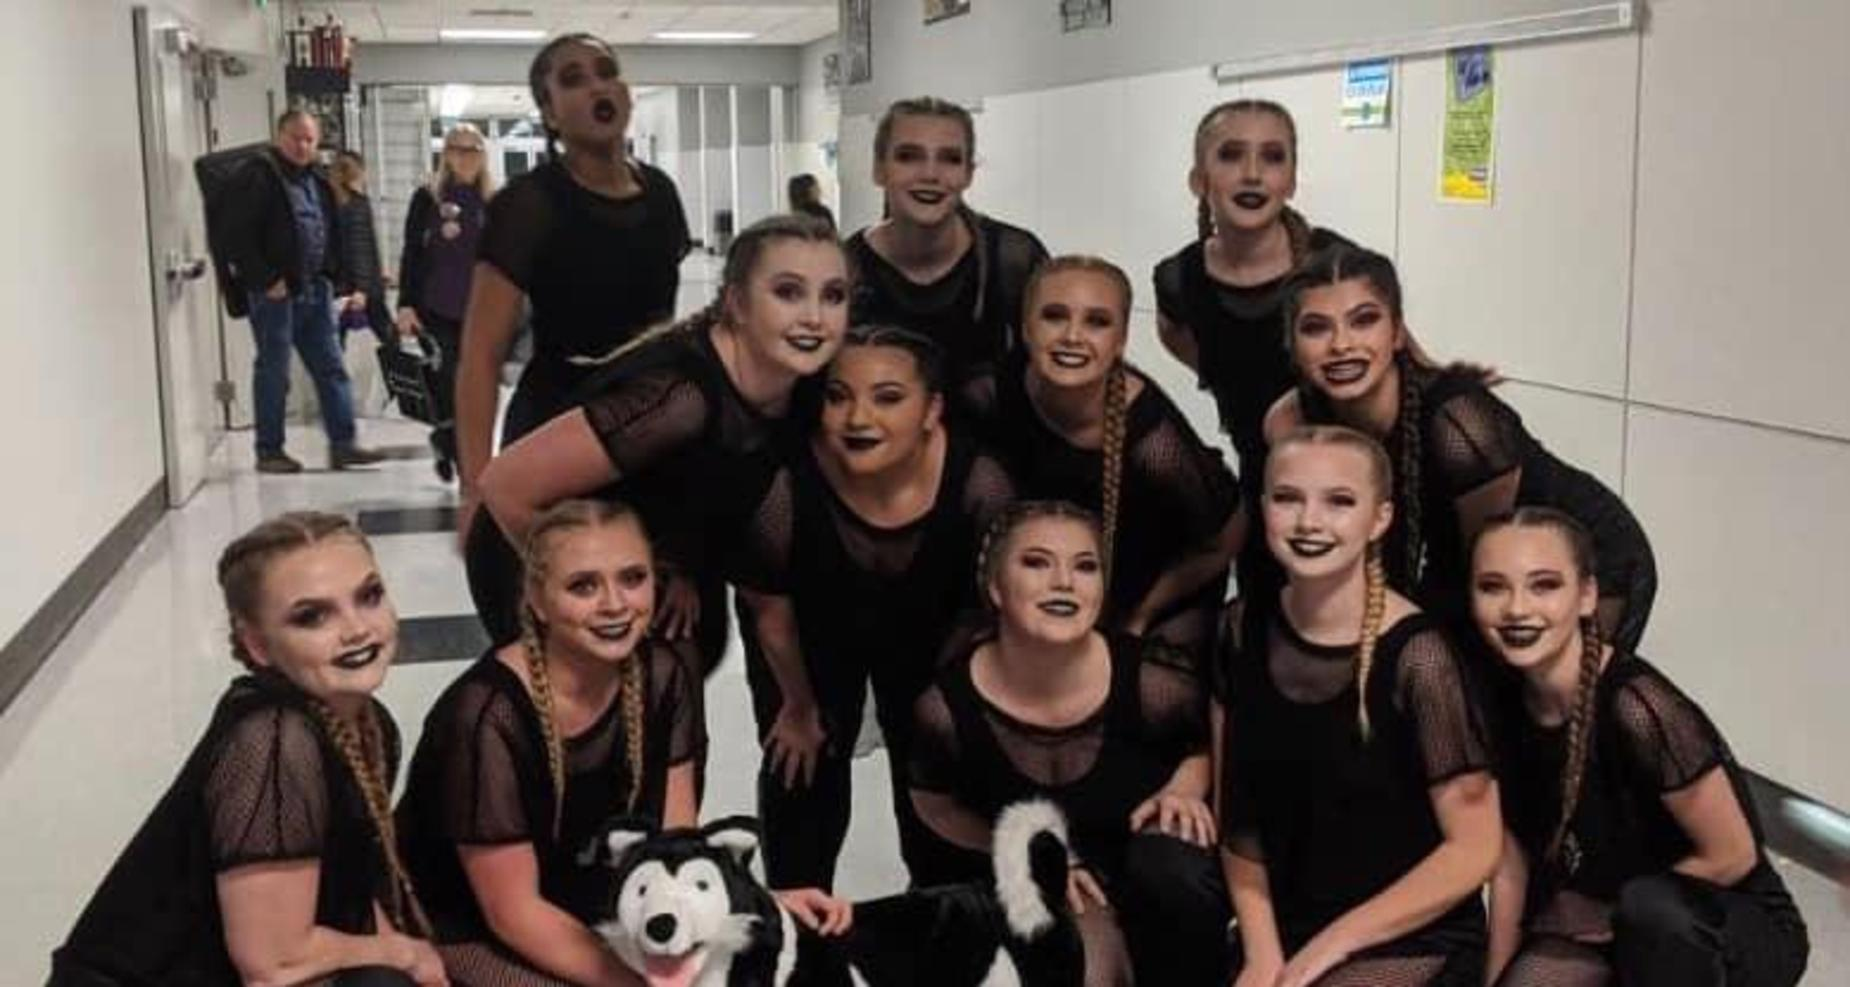 Dance team with Husky.